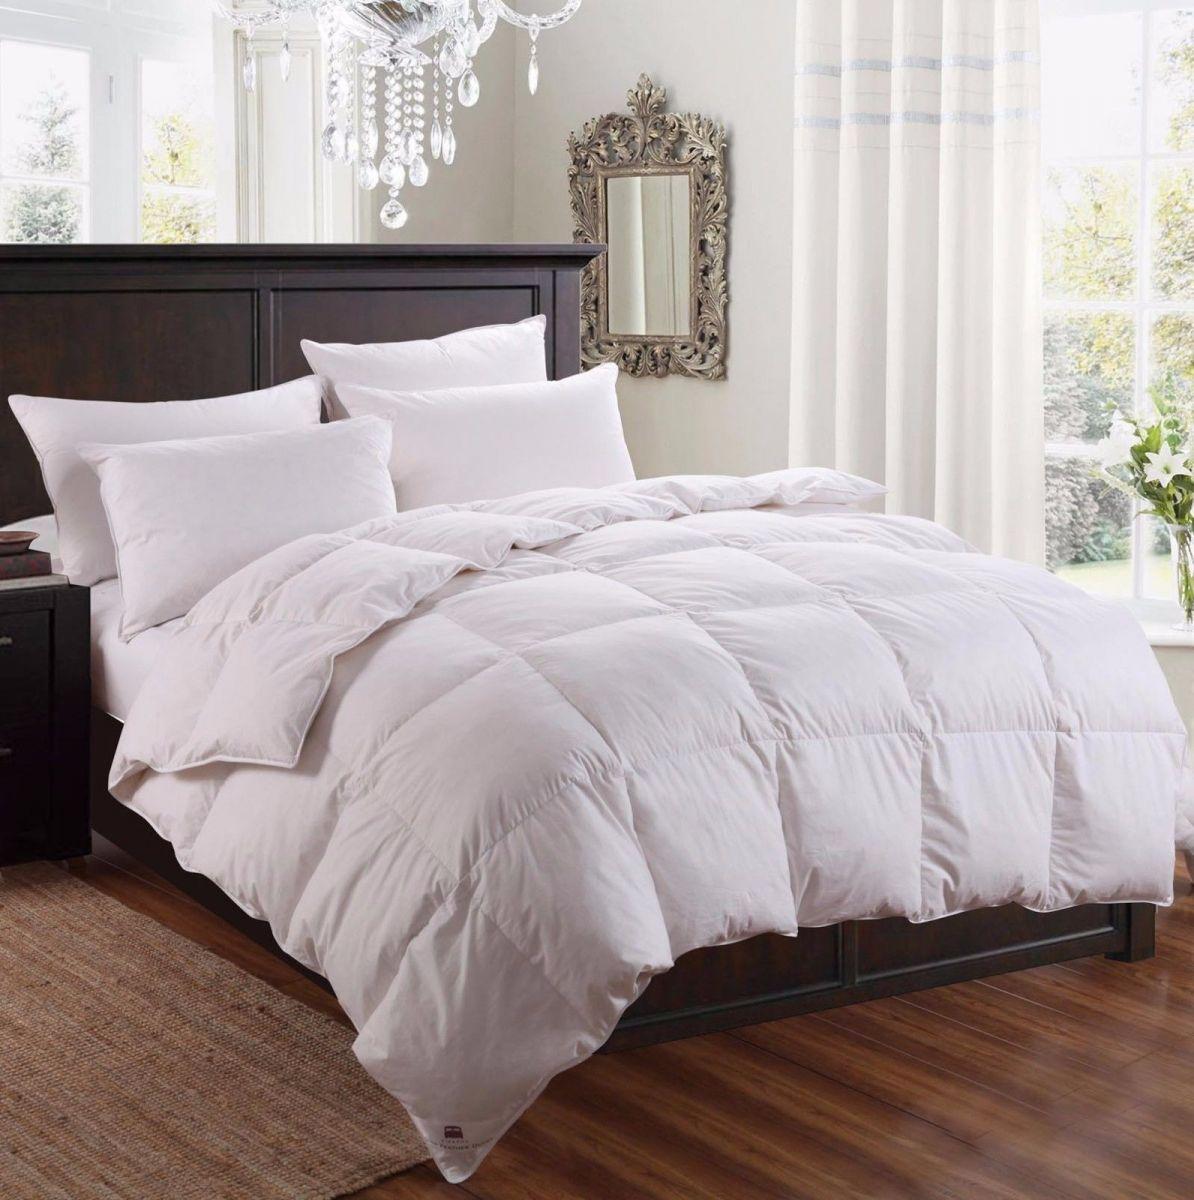 13 5 tog heavy winter warm hollow fibre quilt duvet all. Black Bedroom Furniture Sets. Home Design Ideas